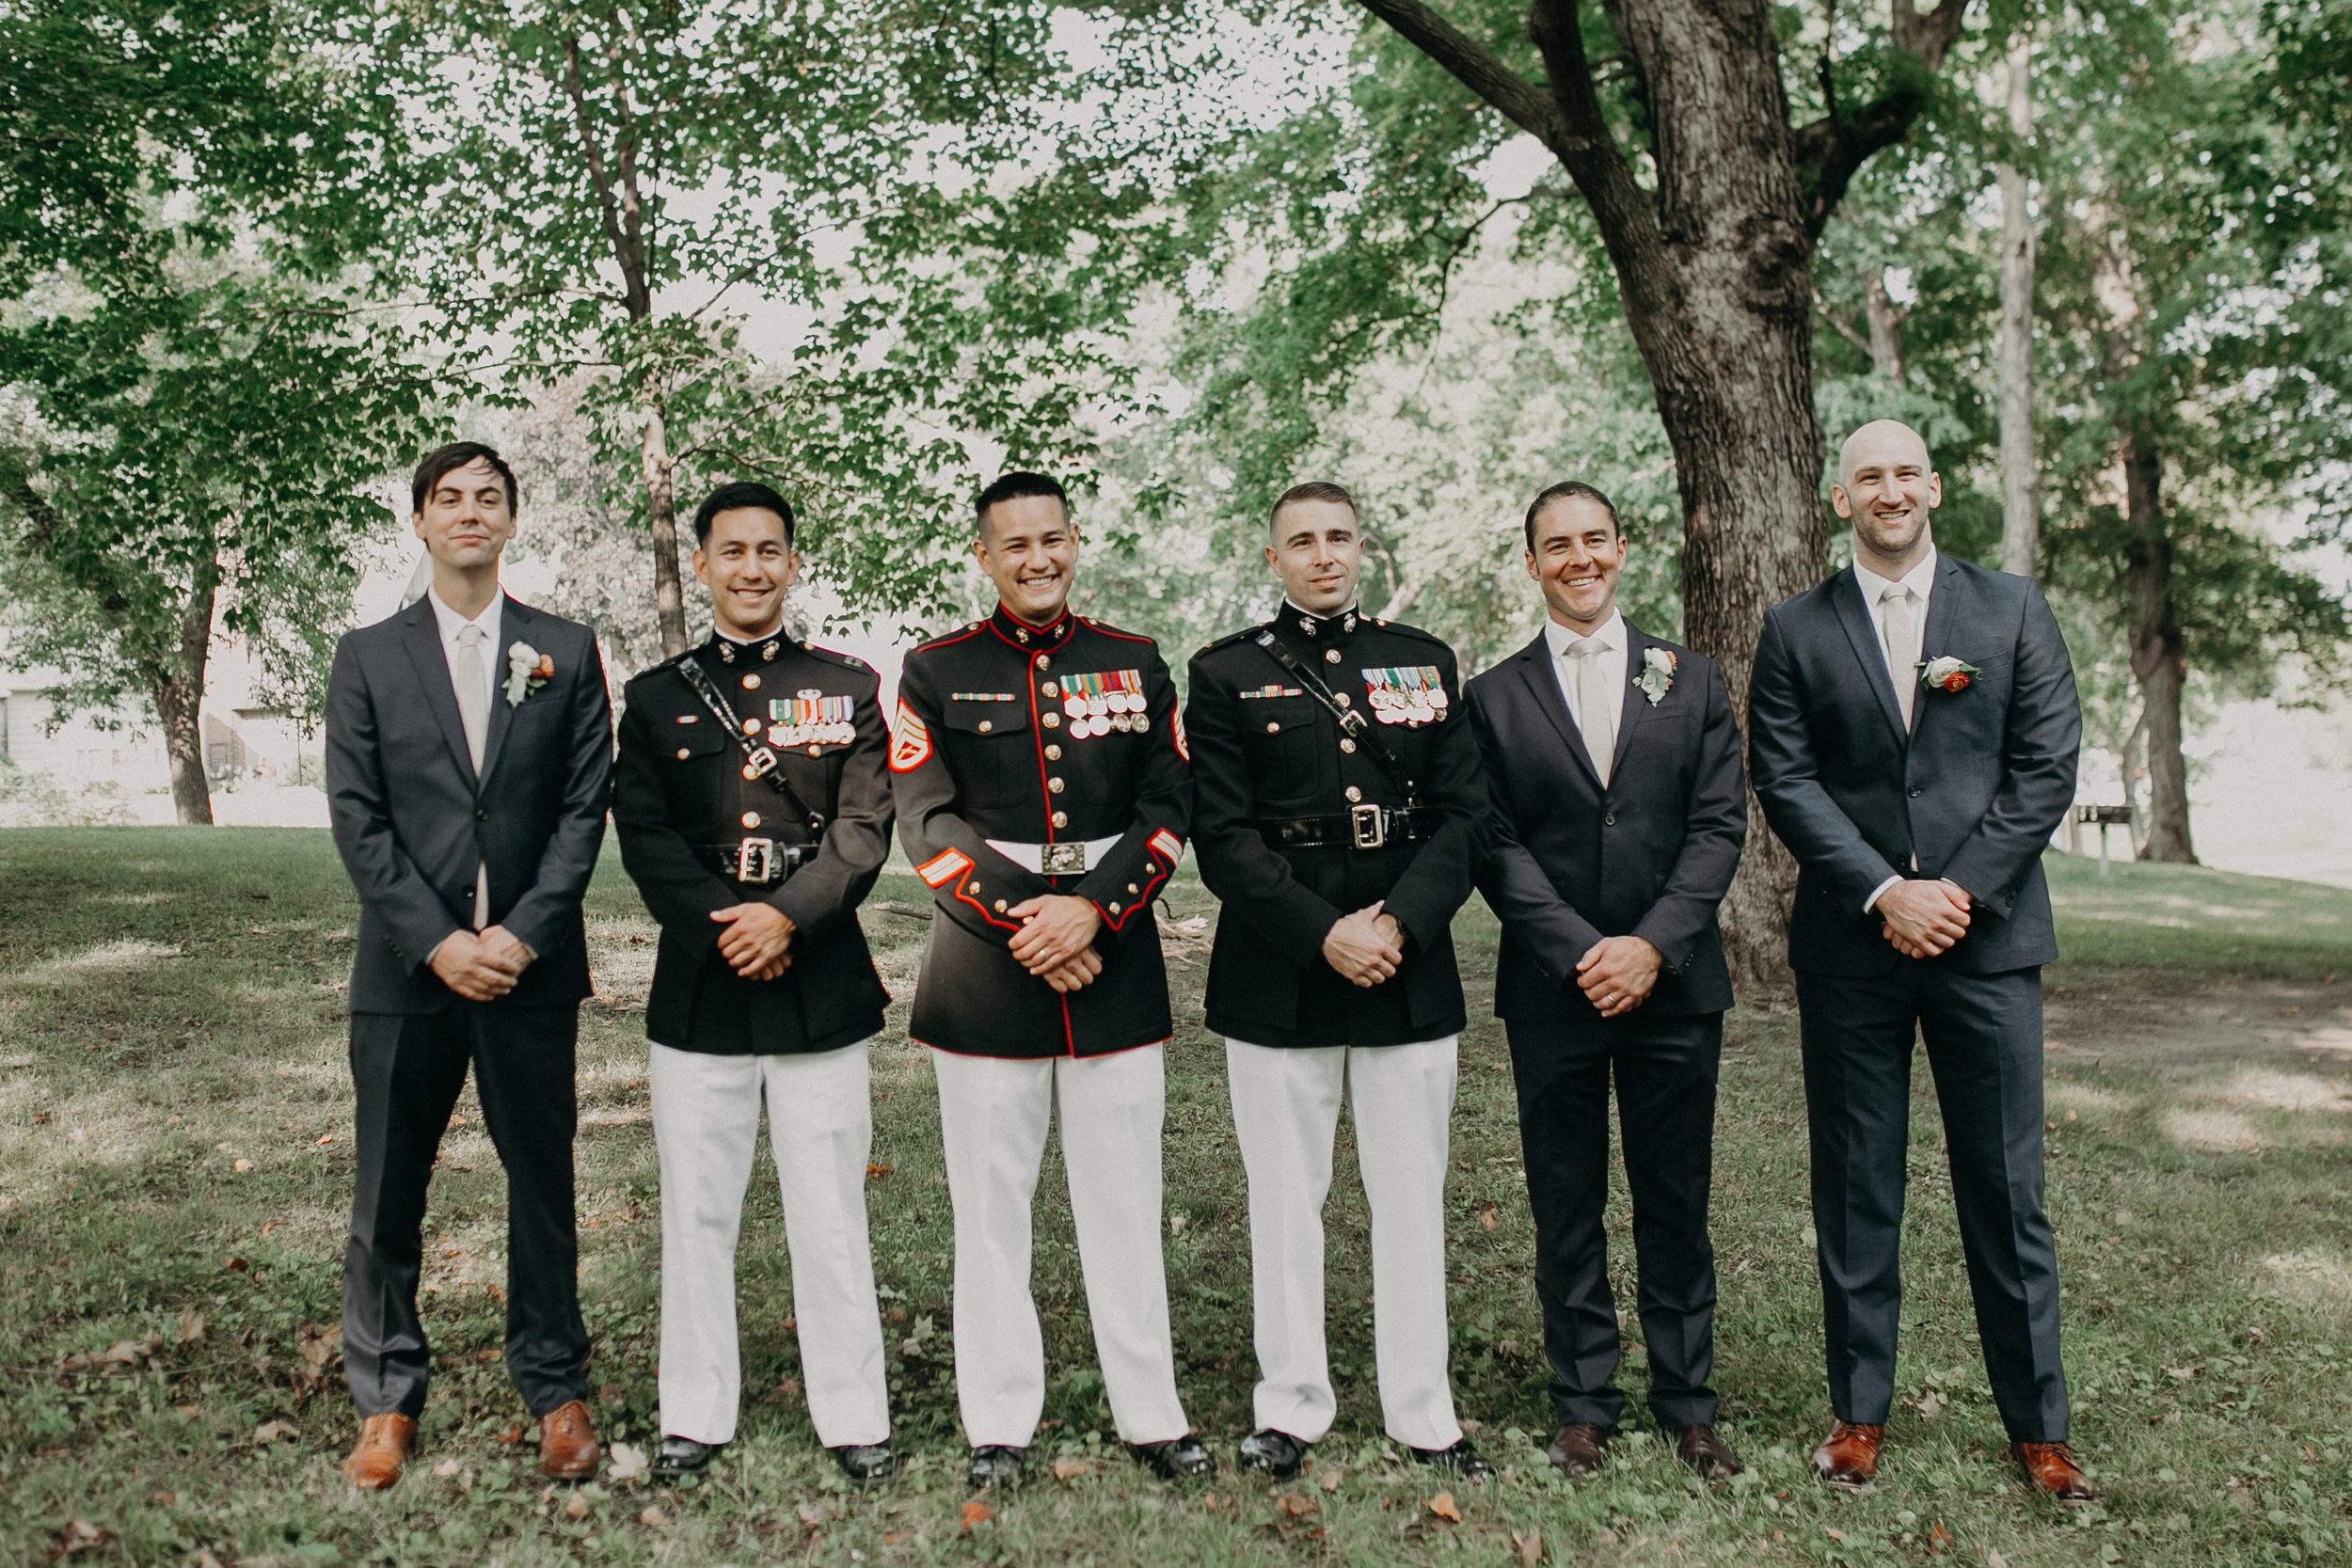 military groom and groomsmen pose for wedding portraits at 6Smith on Lake Minnetonka